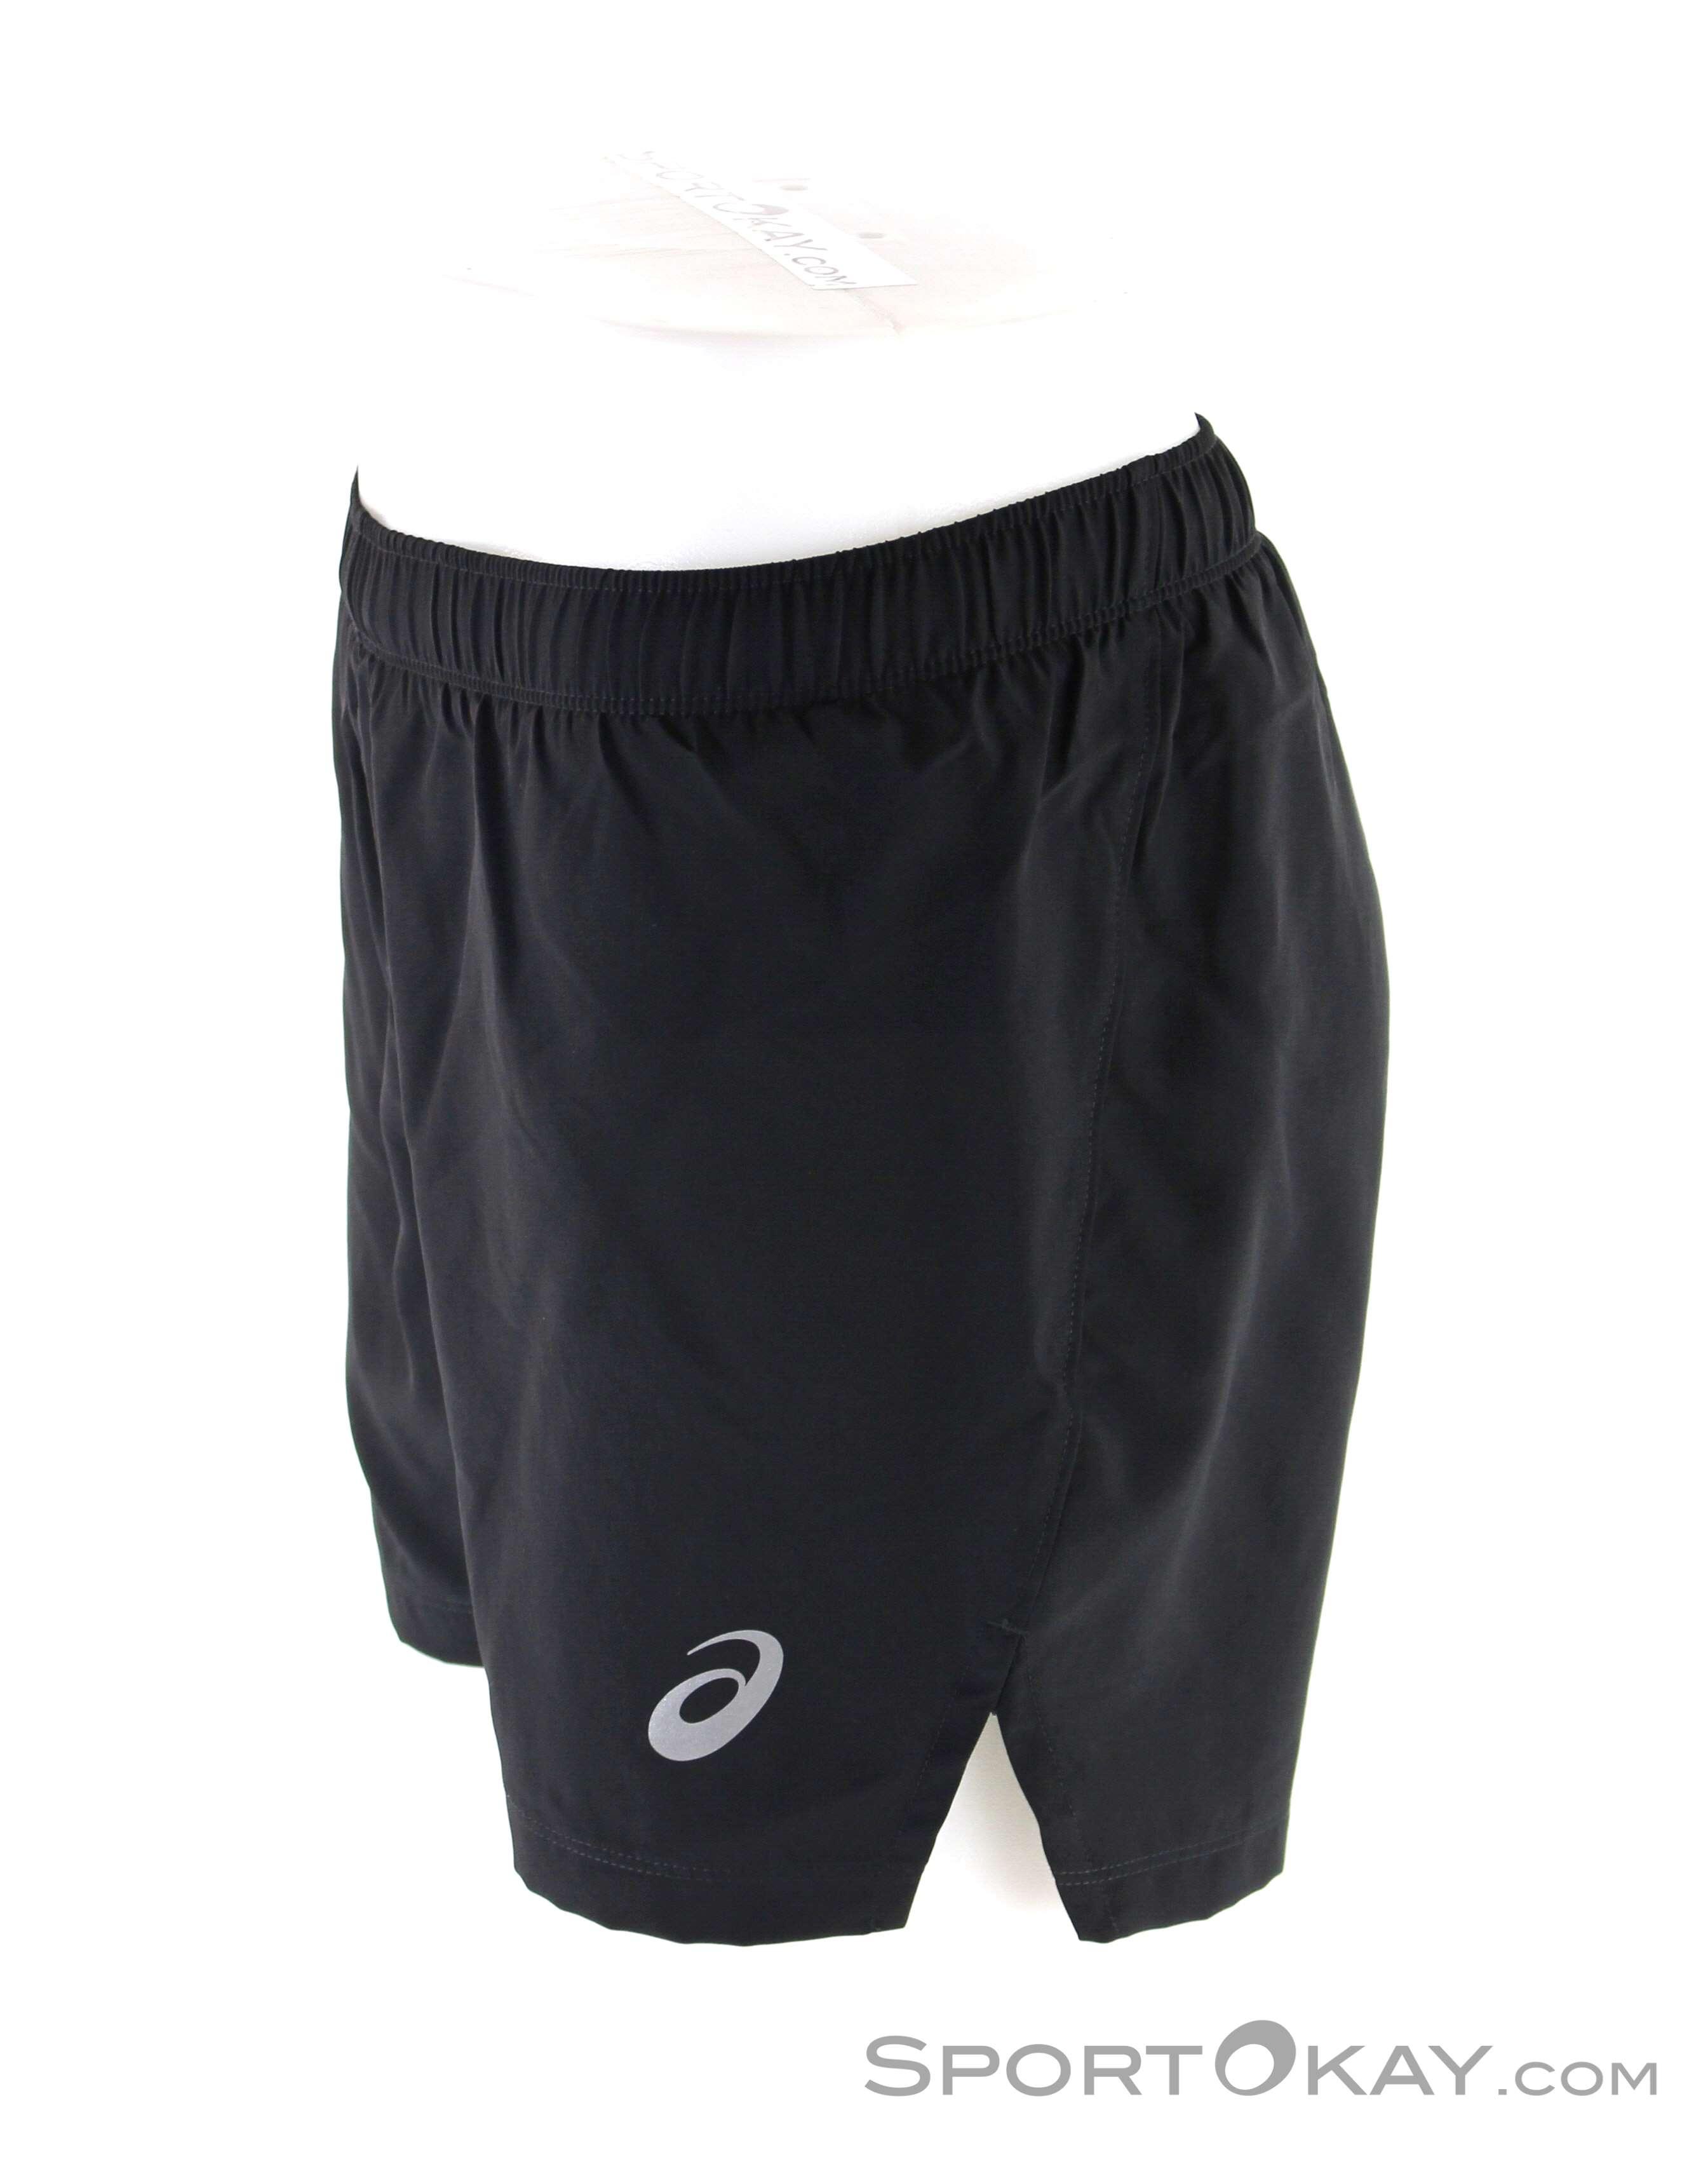 Corsa Asics Da Pantaloni Uomo Pantaloncini 5in Silver Short qTwq4S7